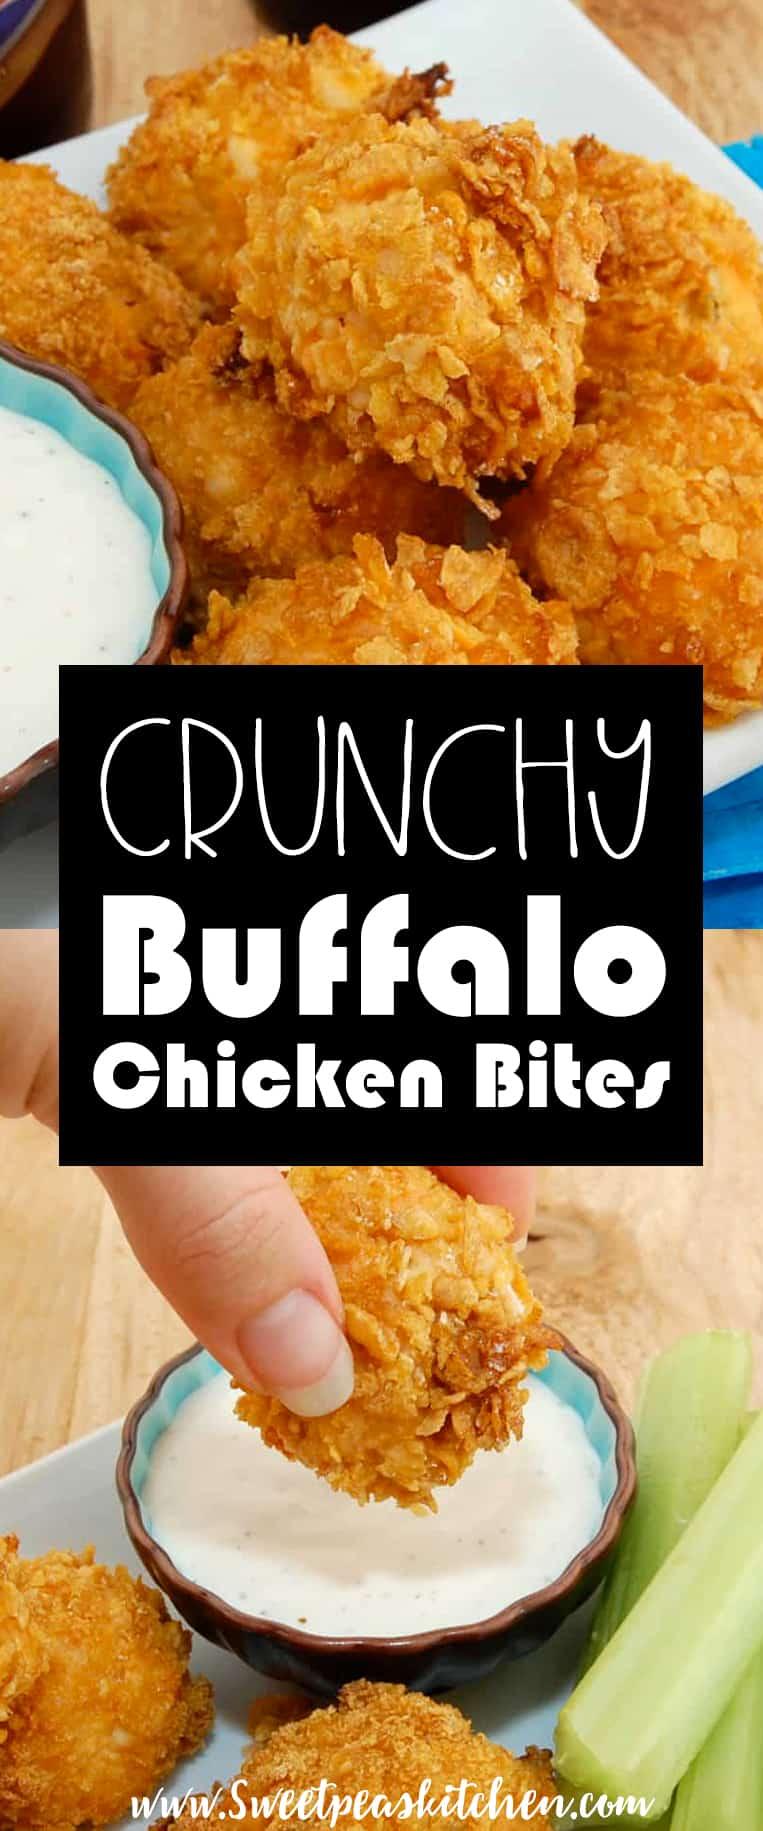 Crunchy Buffalo Chicken Bites Recipe